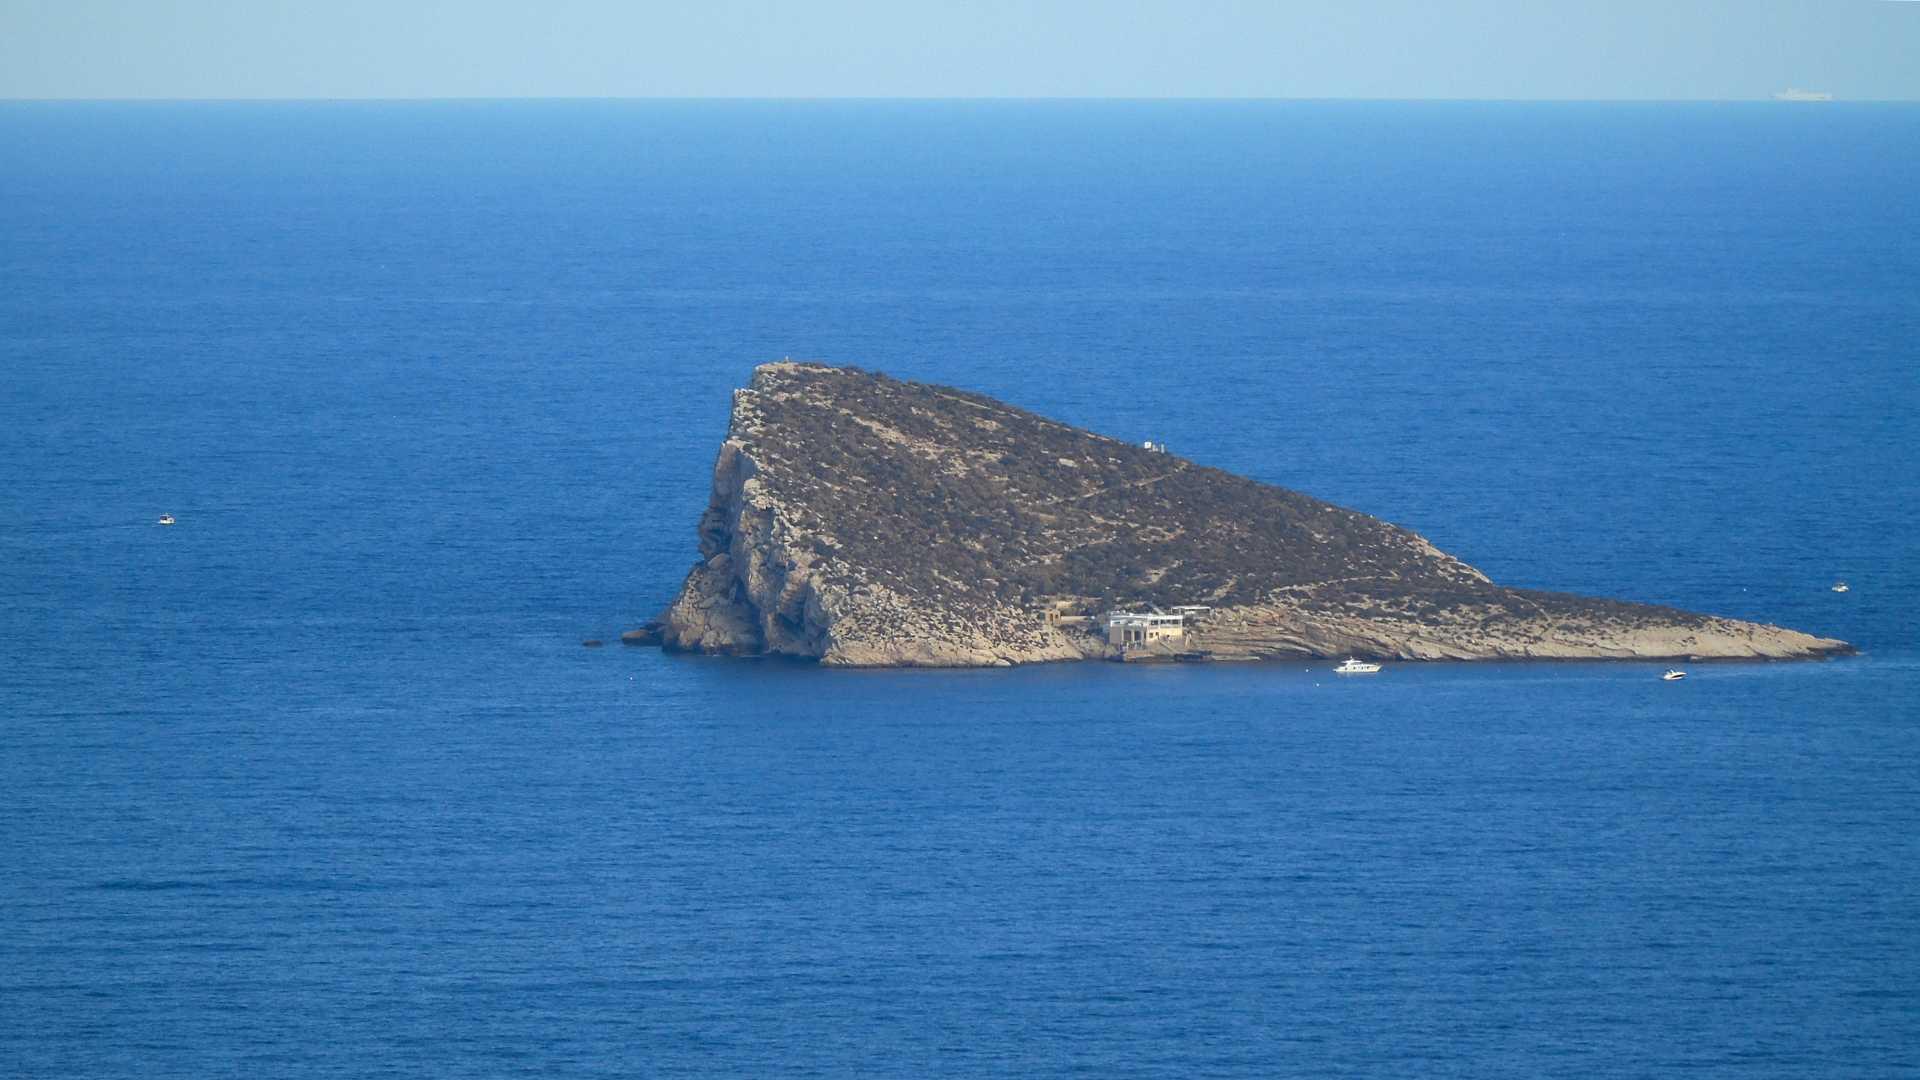 isla de tabarca alicante comunitat valenciana,